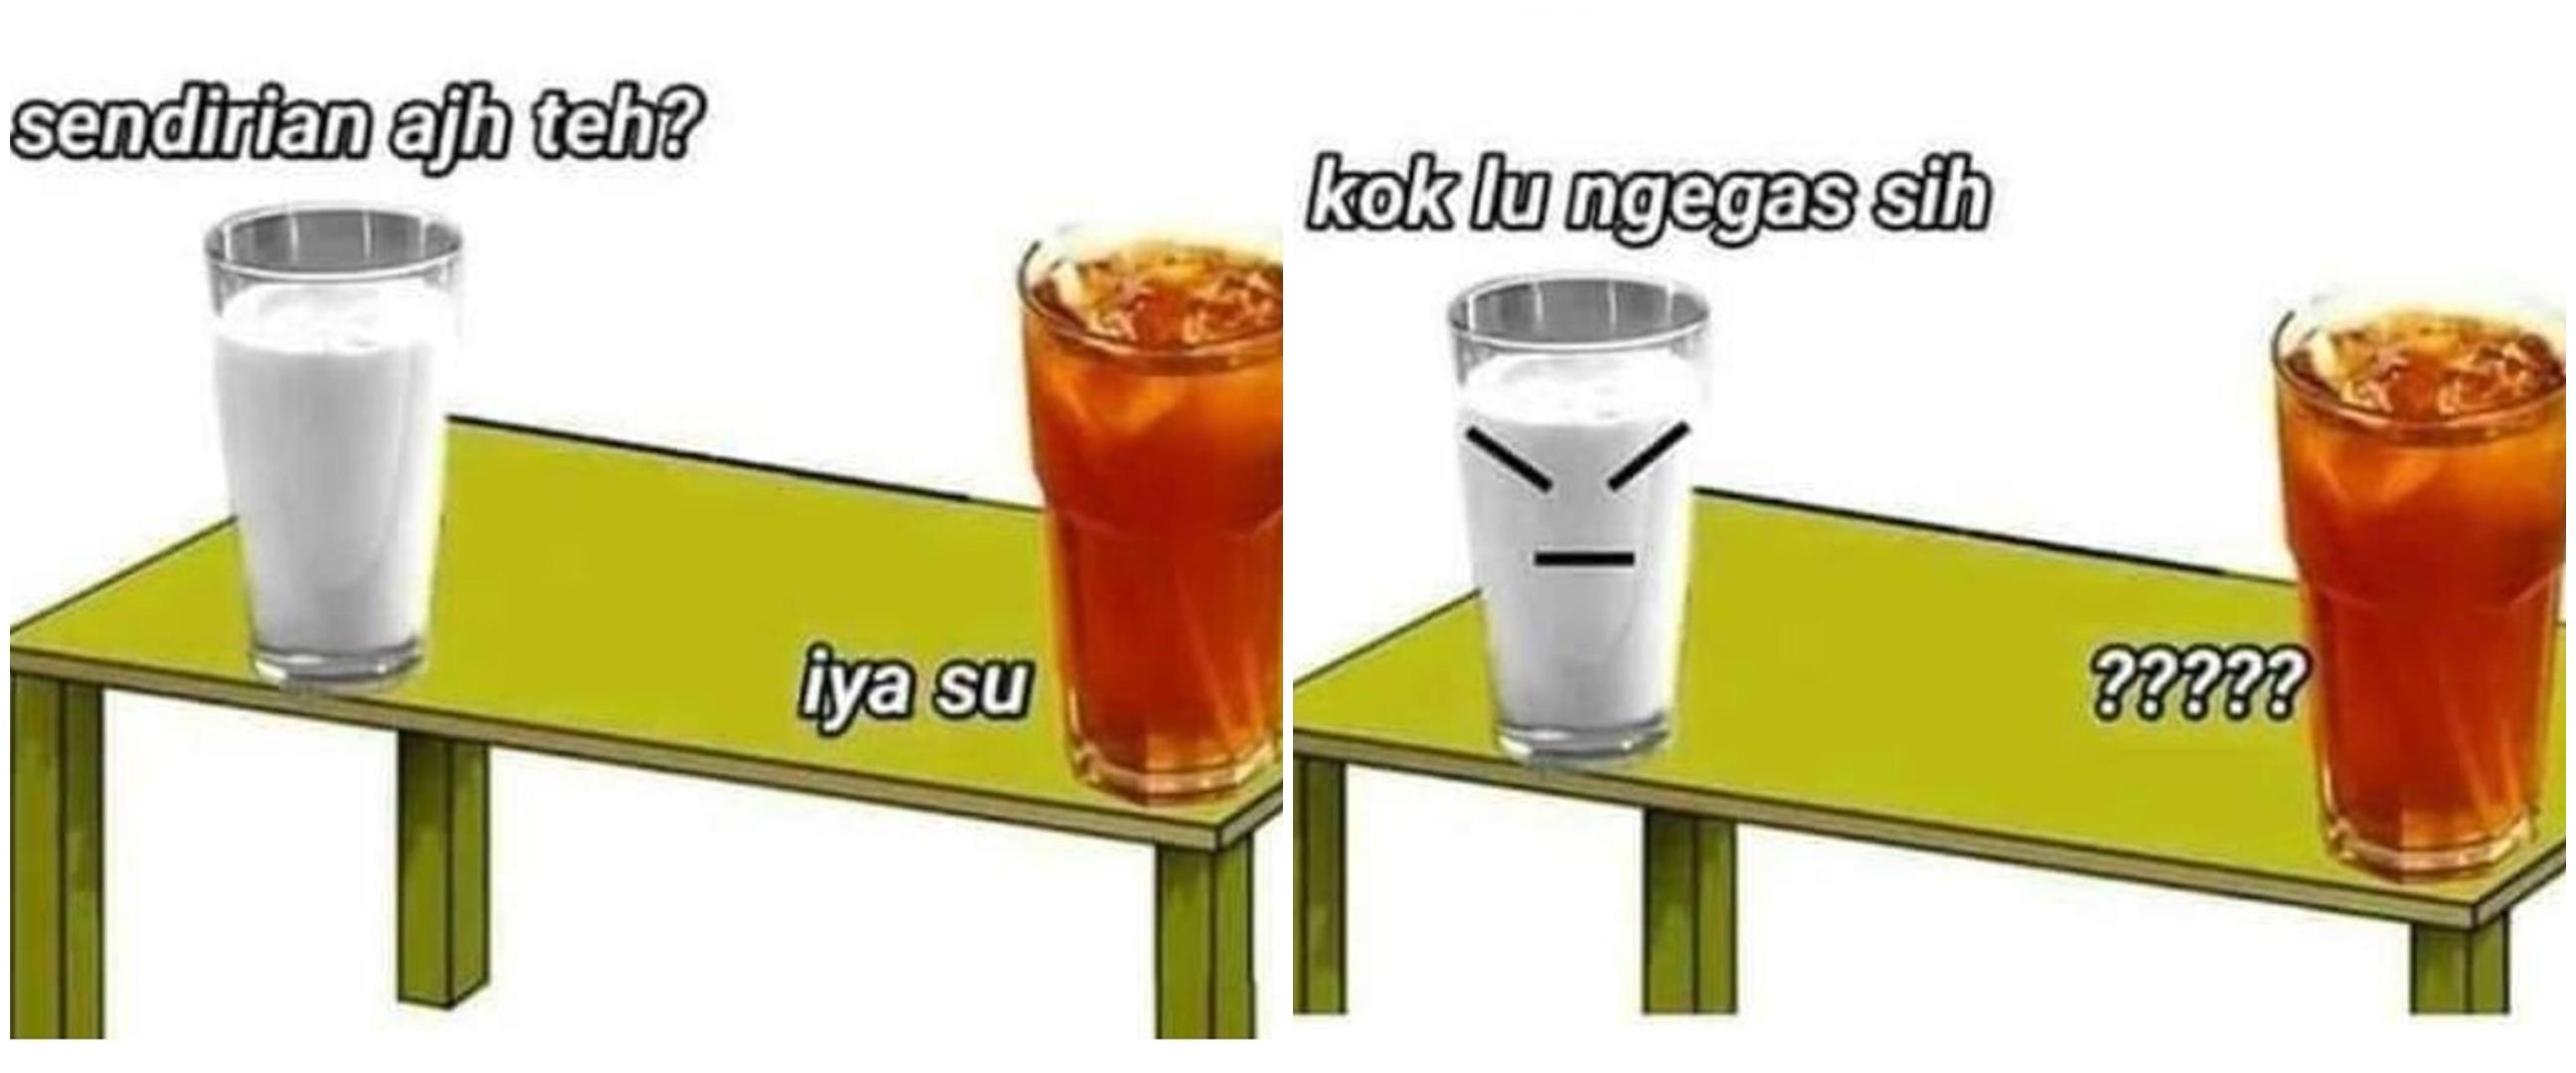 10 Meme minuman teh ini bikin dahi berkerut